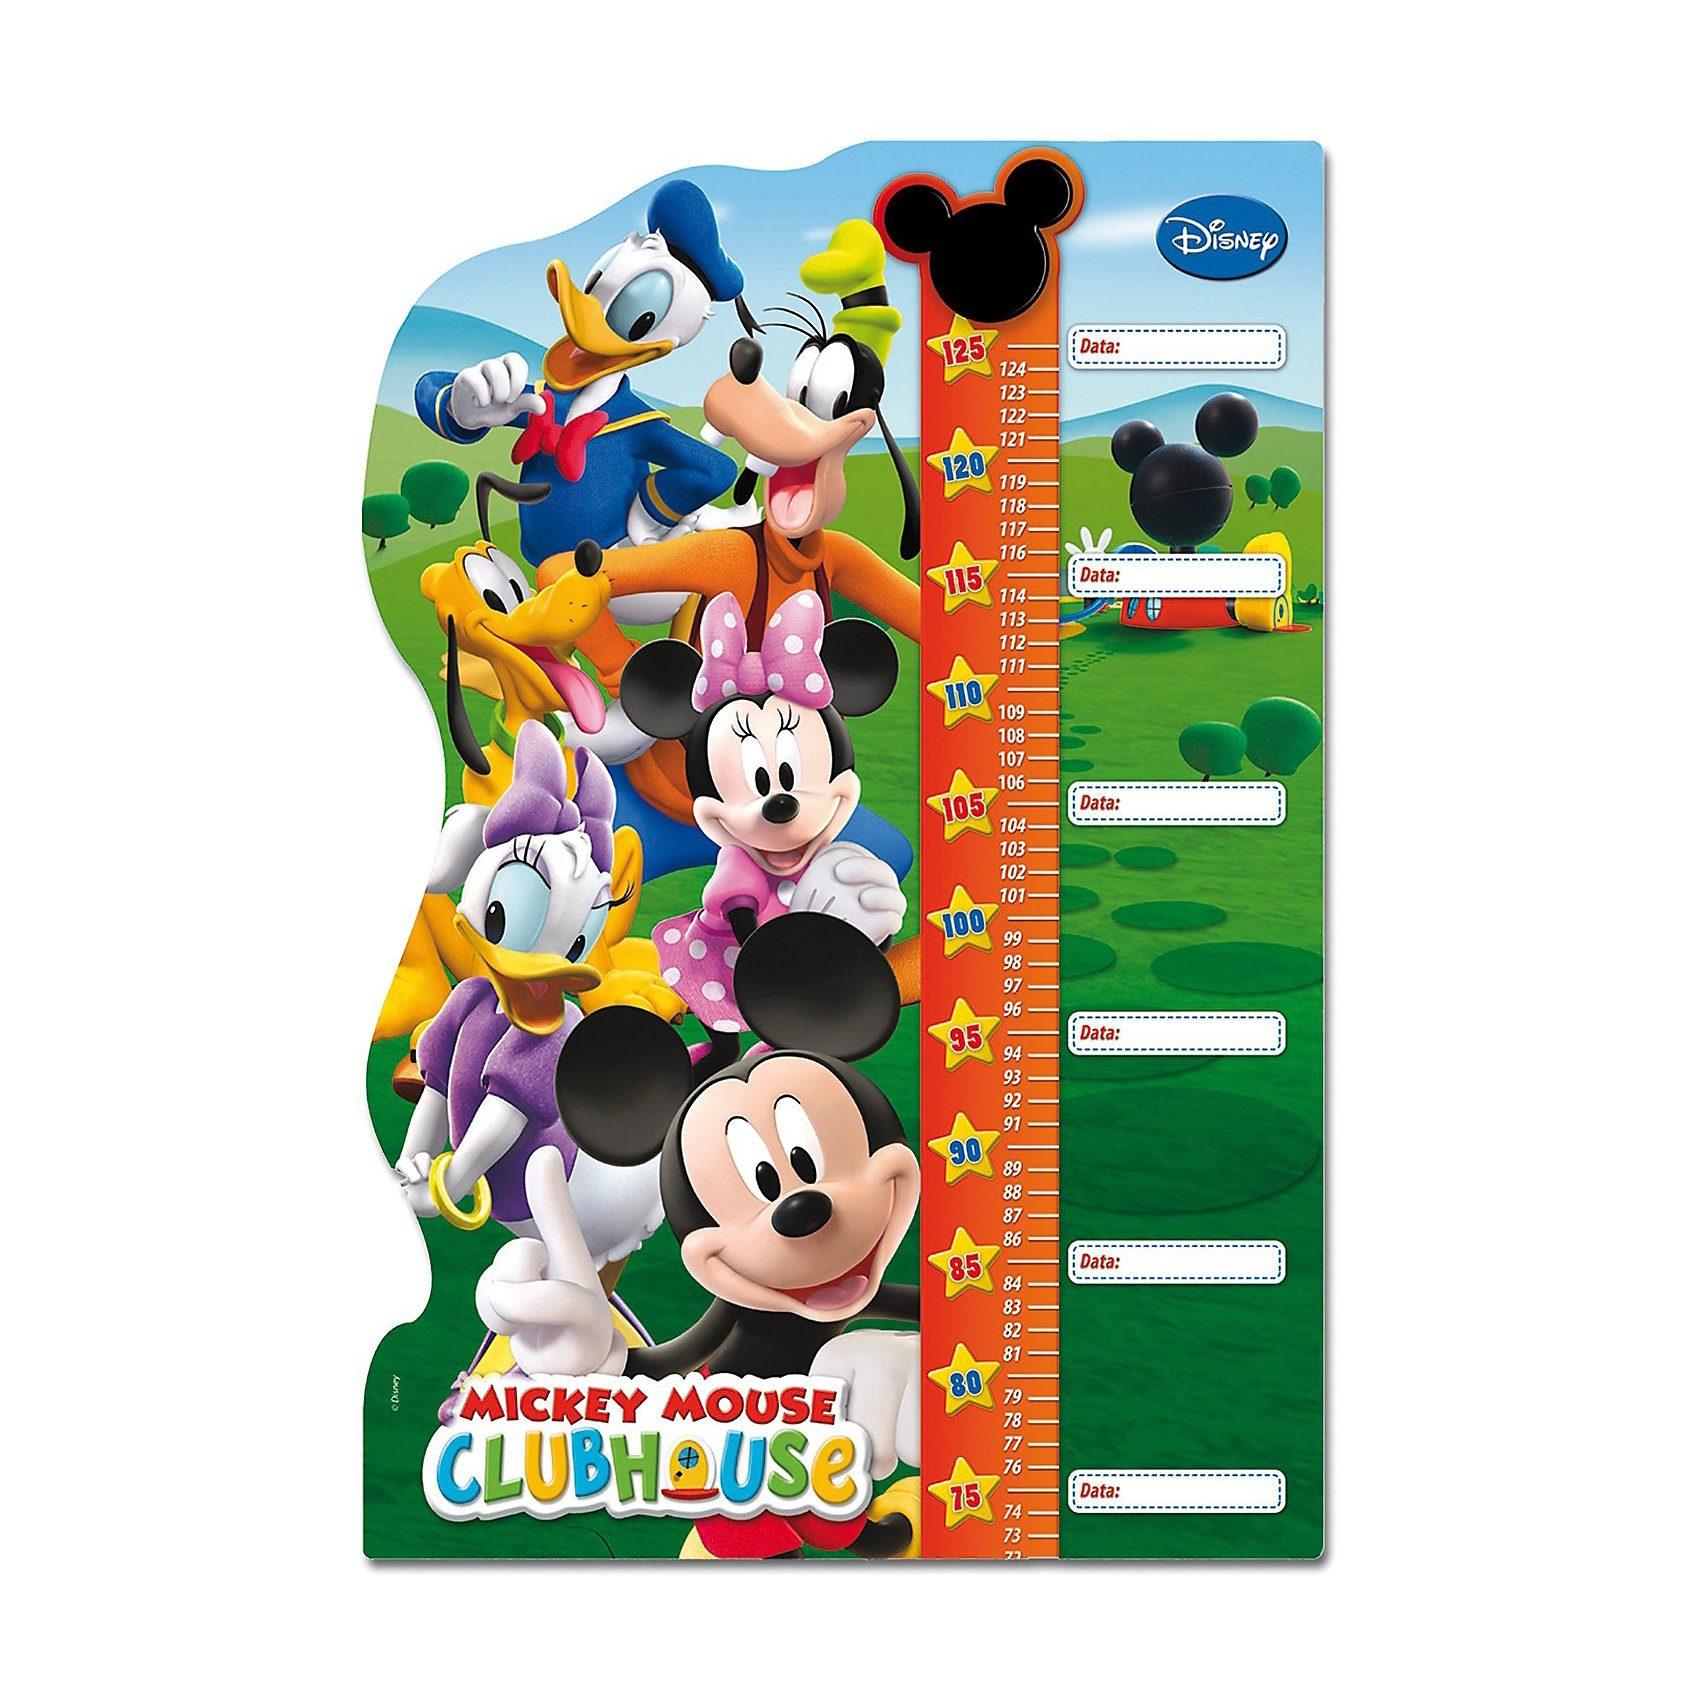 Clementoni Double Fun Puzzle als Messlatte - 30 Teile Maxi Mickey Mouse